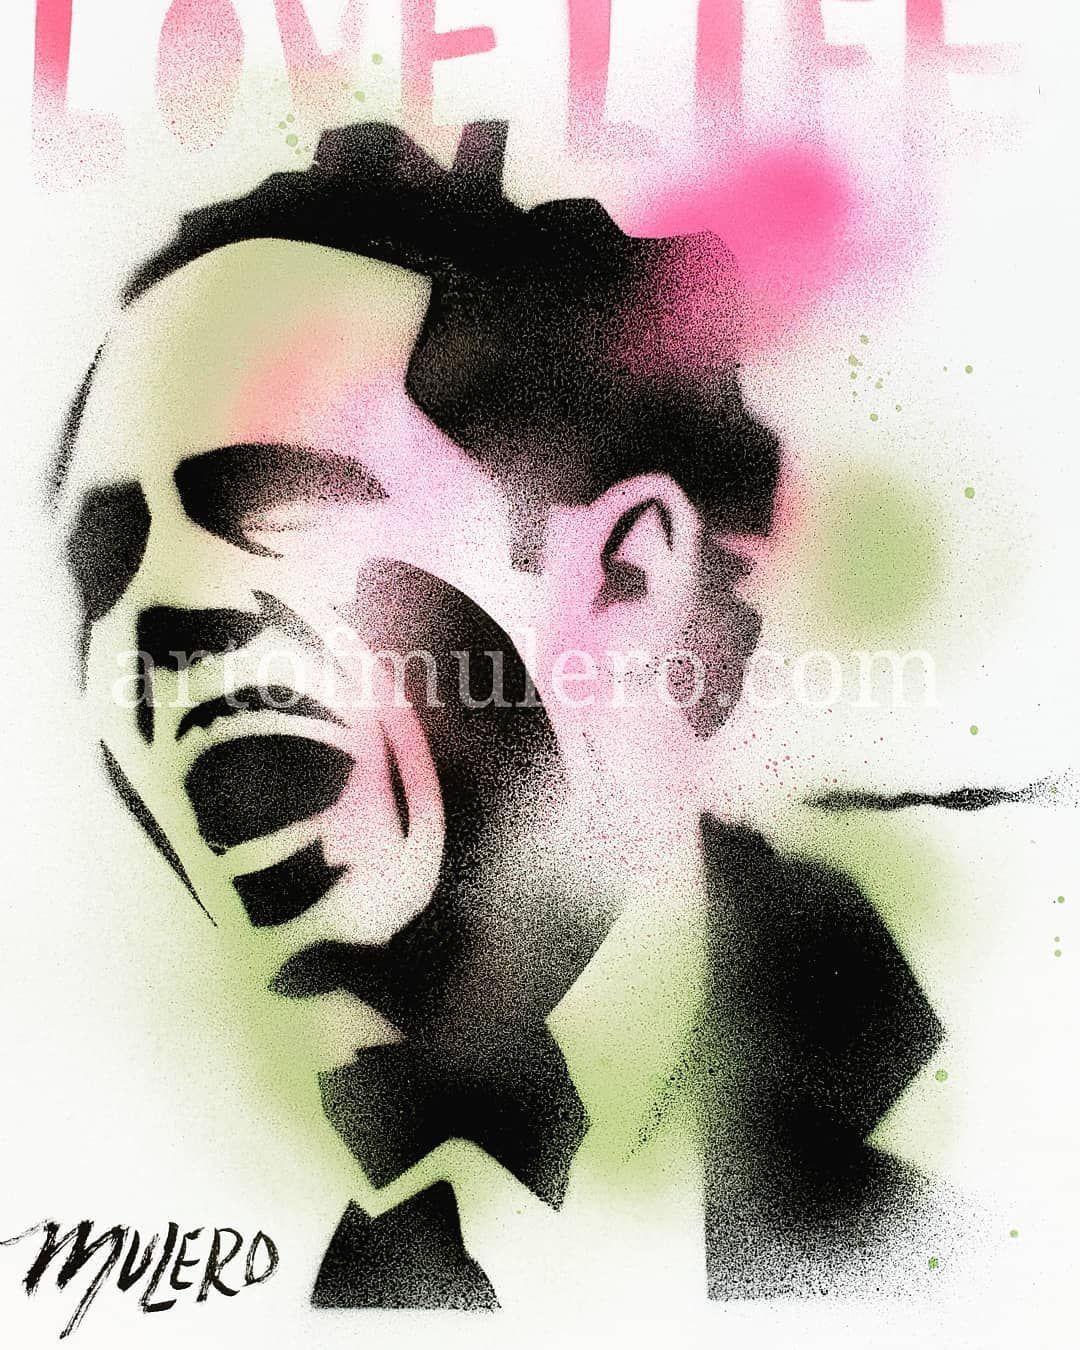 Love life, Albizu. Mixed media on paper  #spraypaint #beautiful #instagood #artist #albizu #puertorico #boricua #latinx #latino #hispanic #amor #artsy #drawing #painting #love #graffiti #streetart #spraypaint #greatness #nevergiveup #resist #brooklyn #brazil #mexico #taino #jibaro